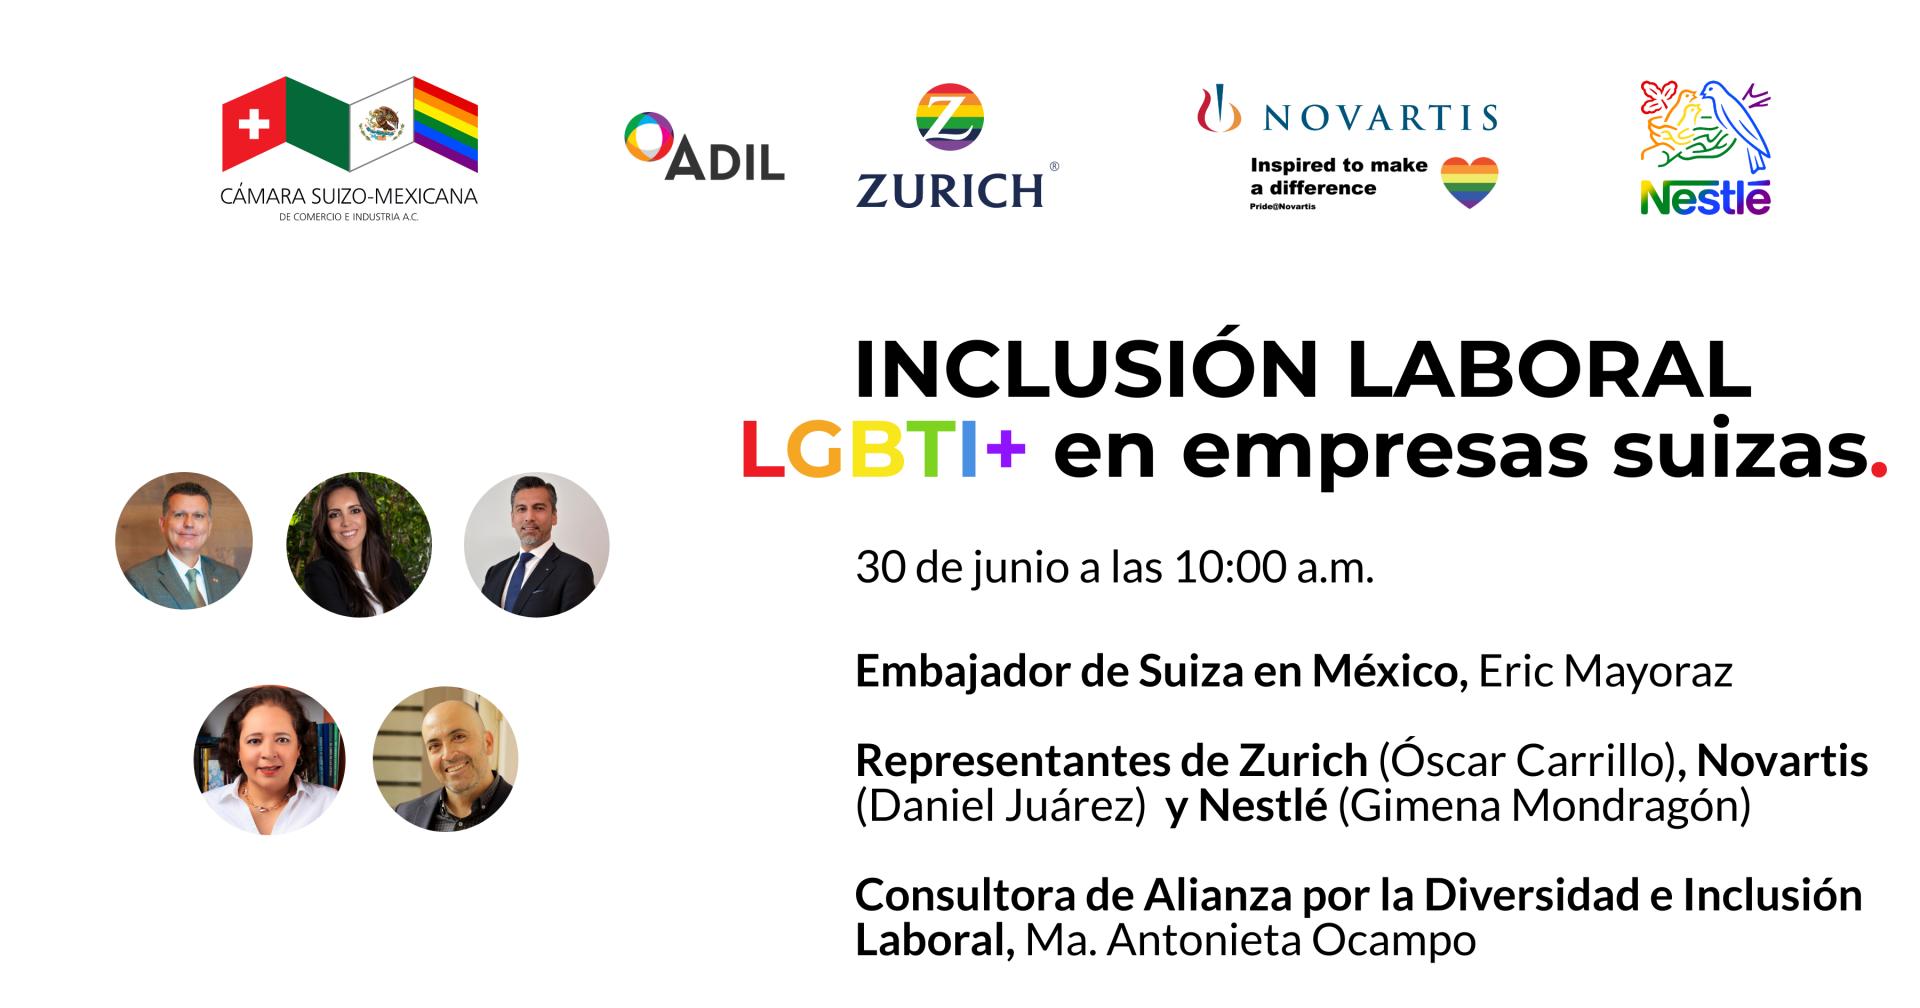 Webinar: LGBTI+ labor inclusion in Swiss companies